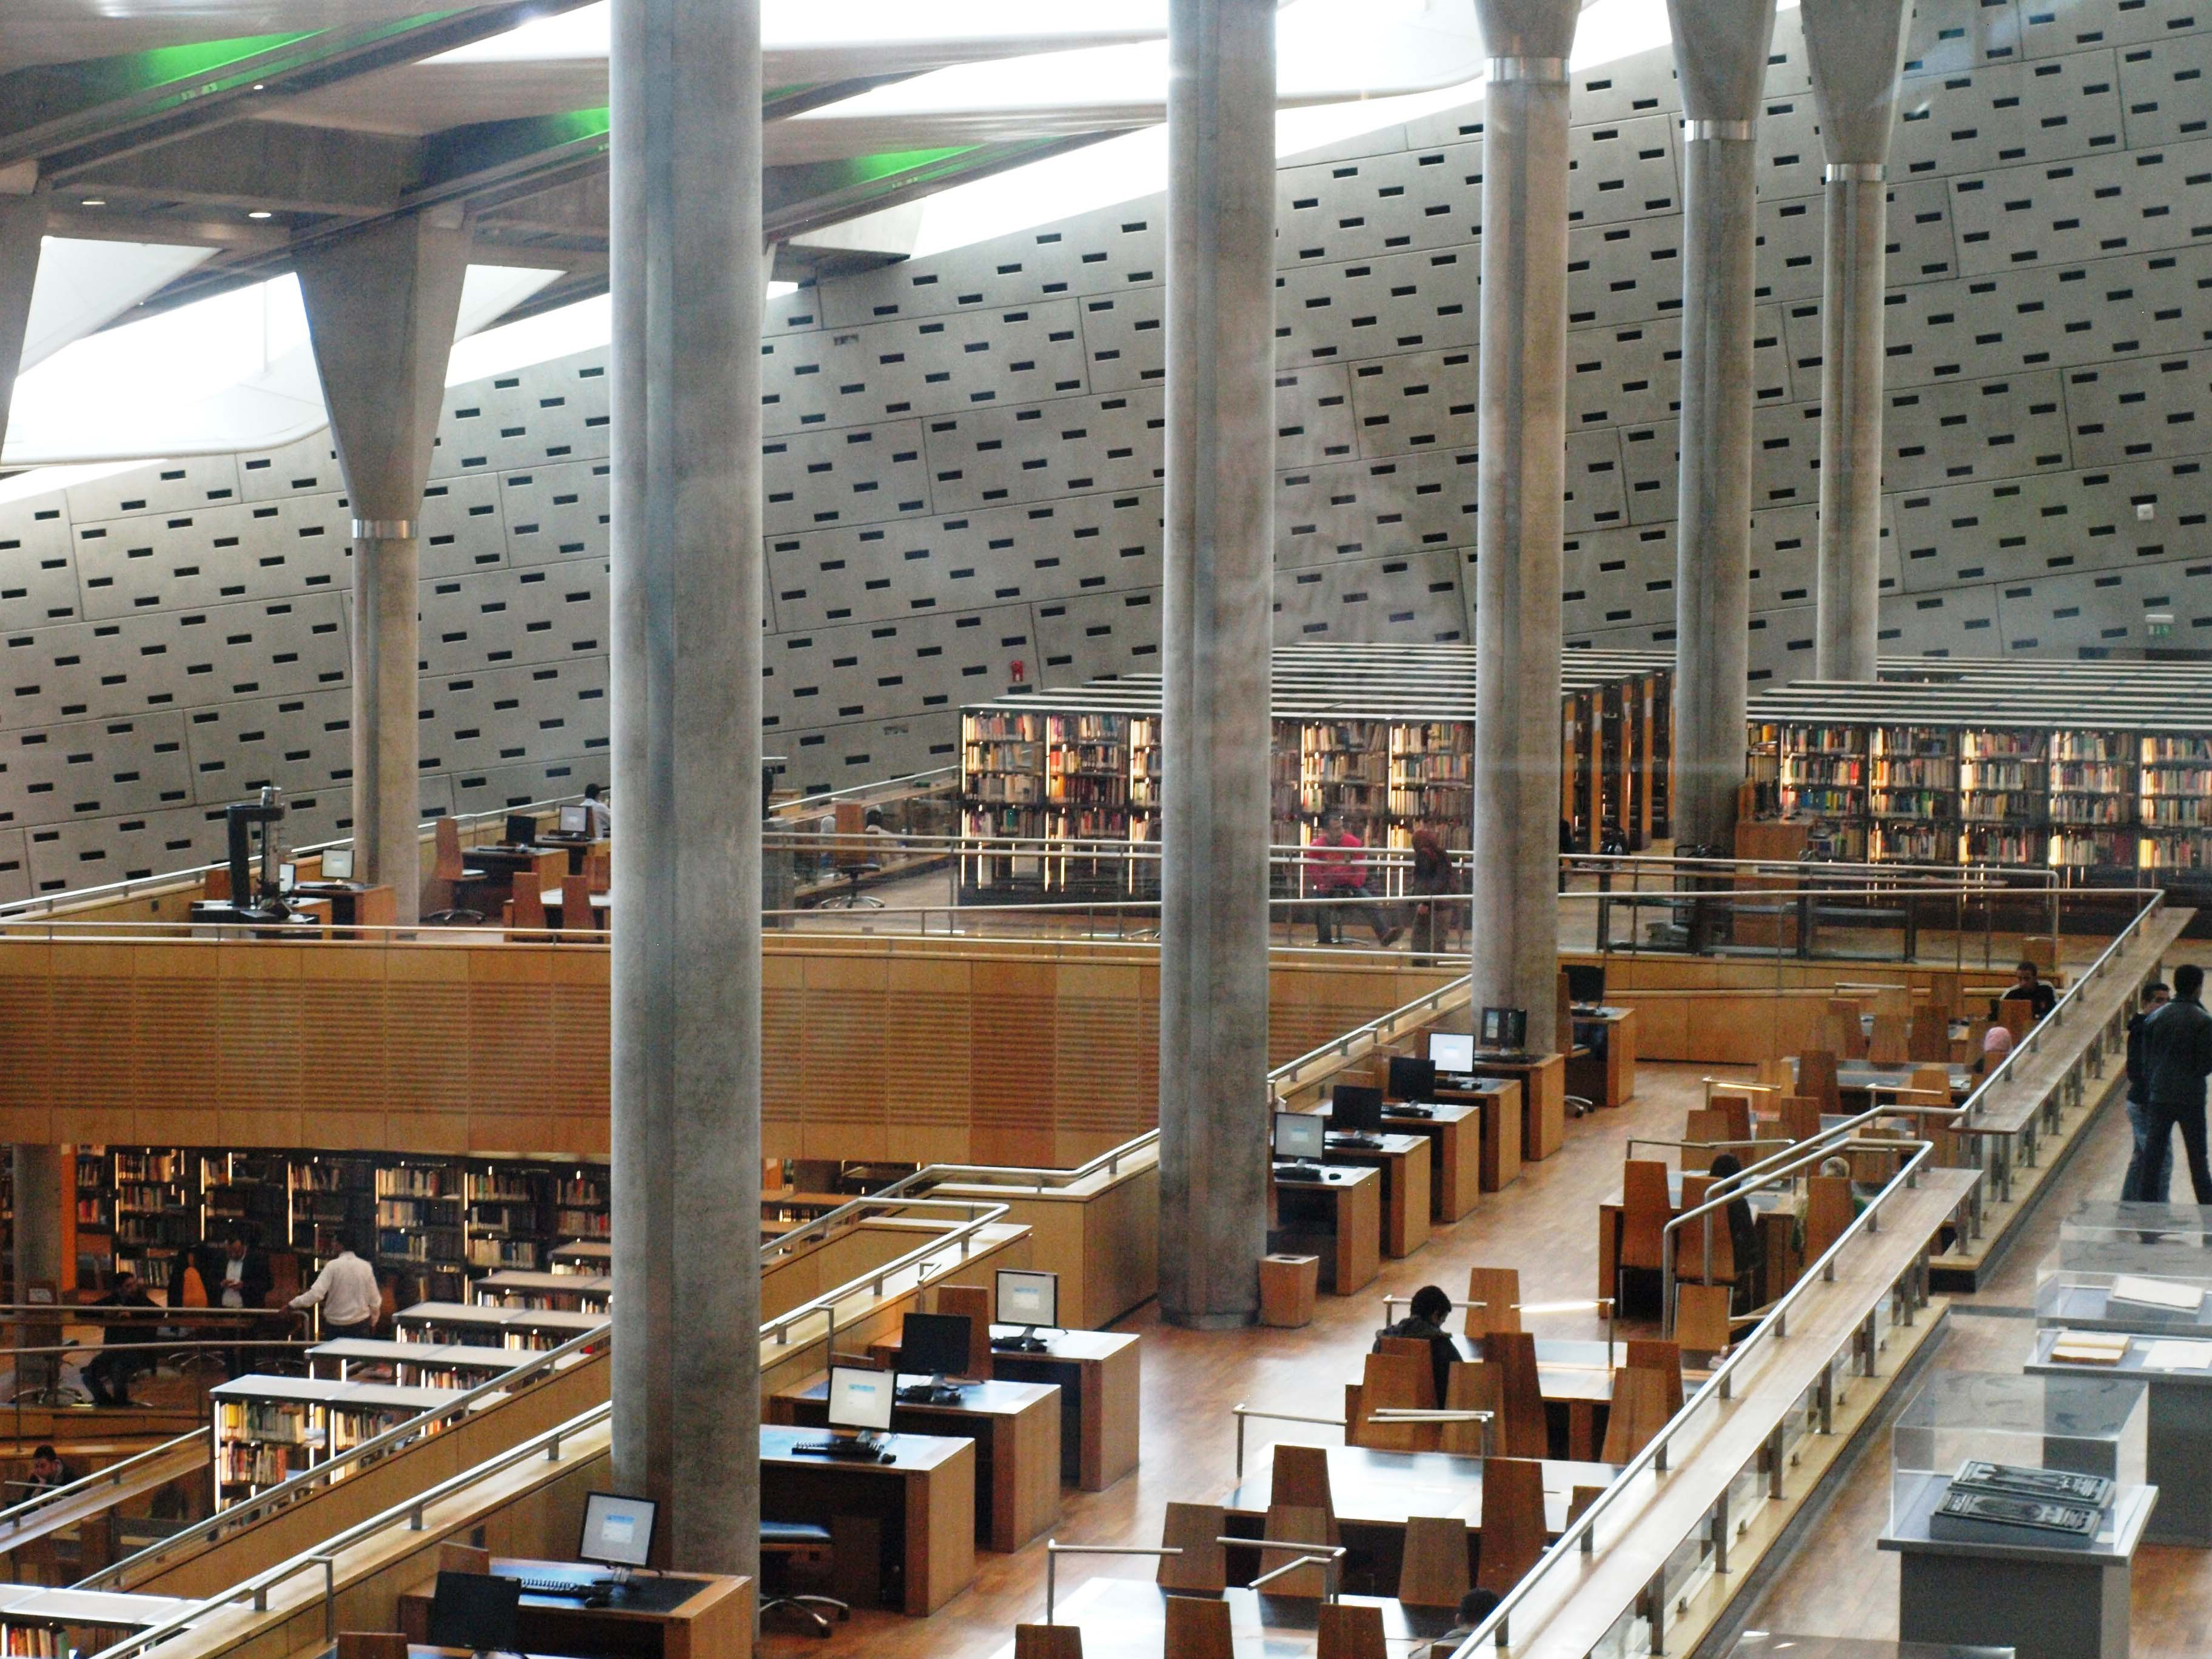 bibliothek alexandria